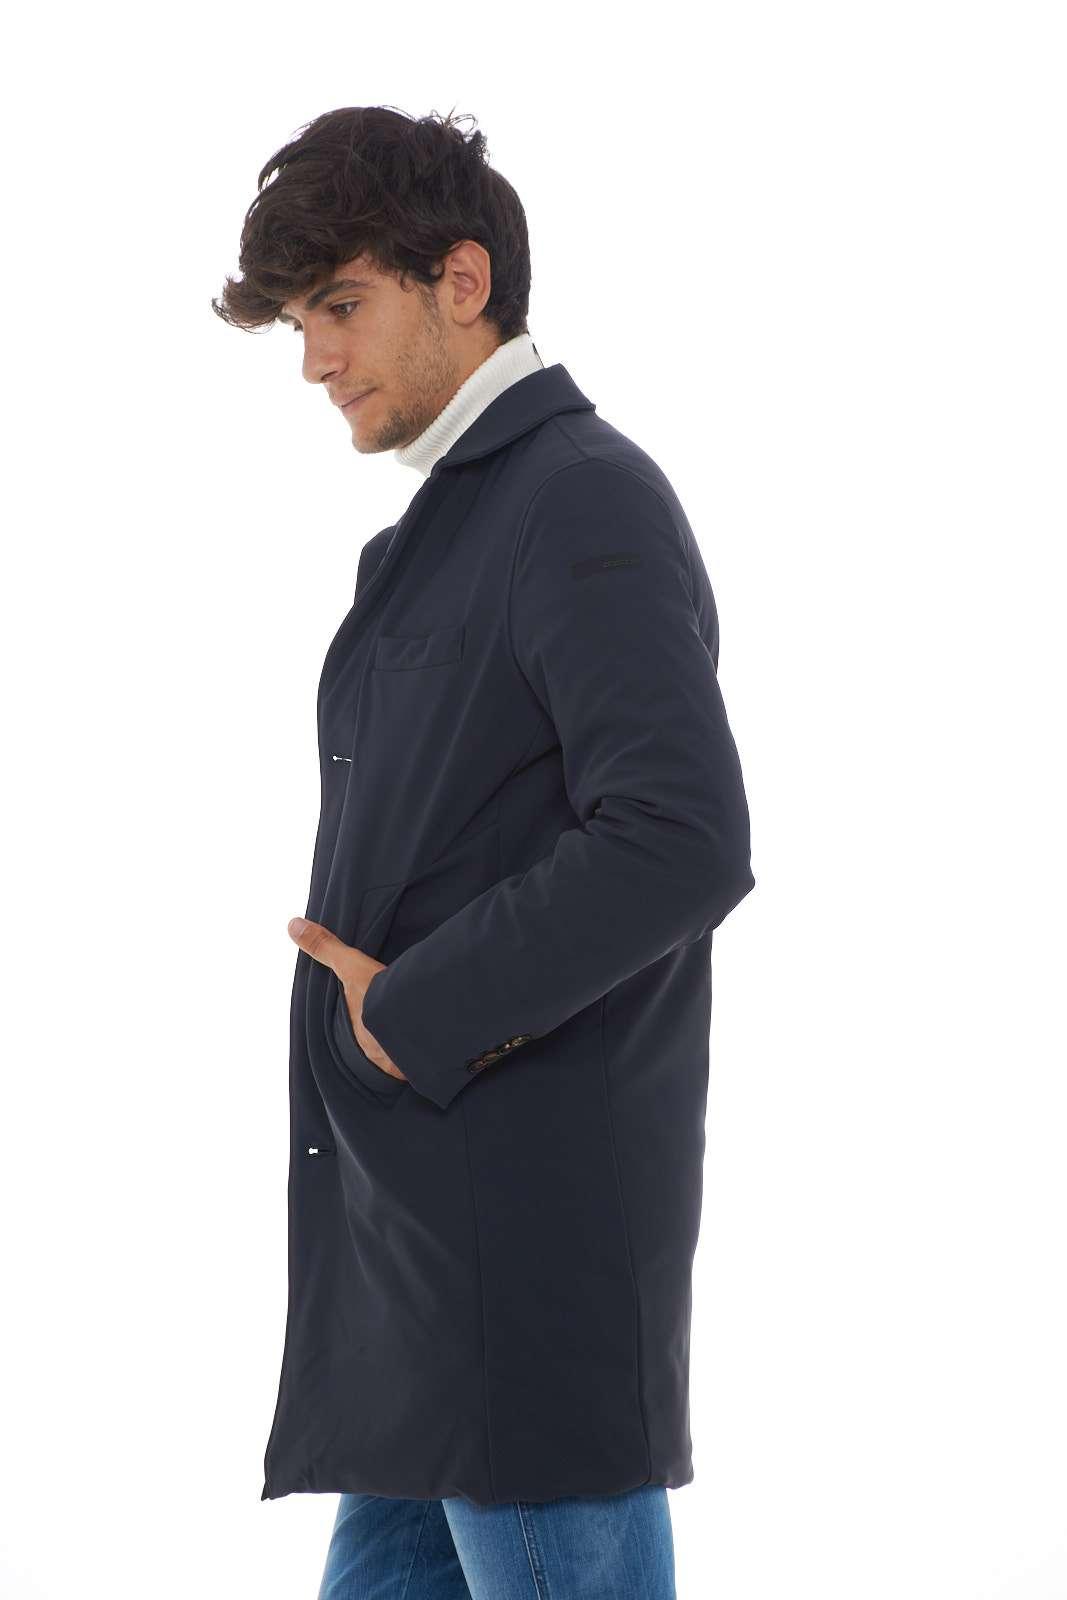 https://www.parmax.com/media/catalog/product/a/i/ai-outlet_parmax-giaccone-uomo-rrd-w18006-b.jpg